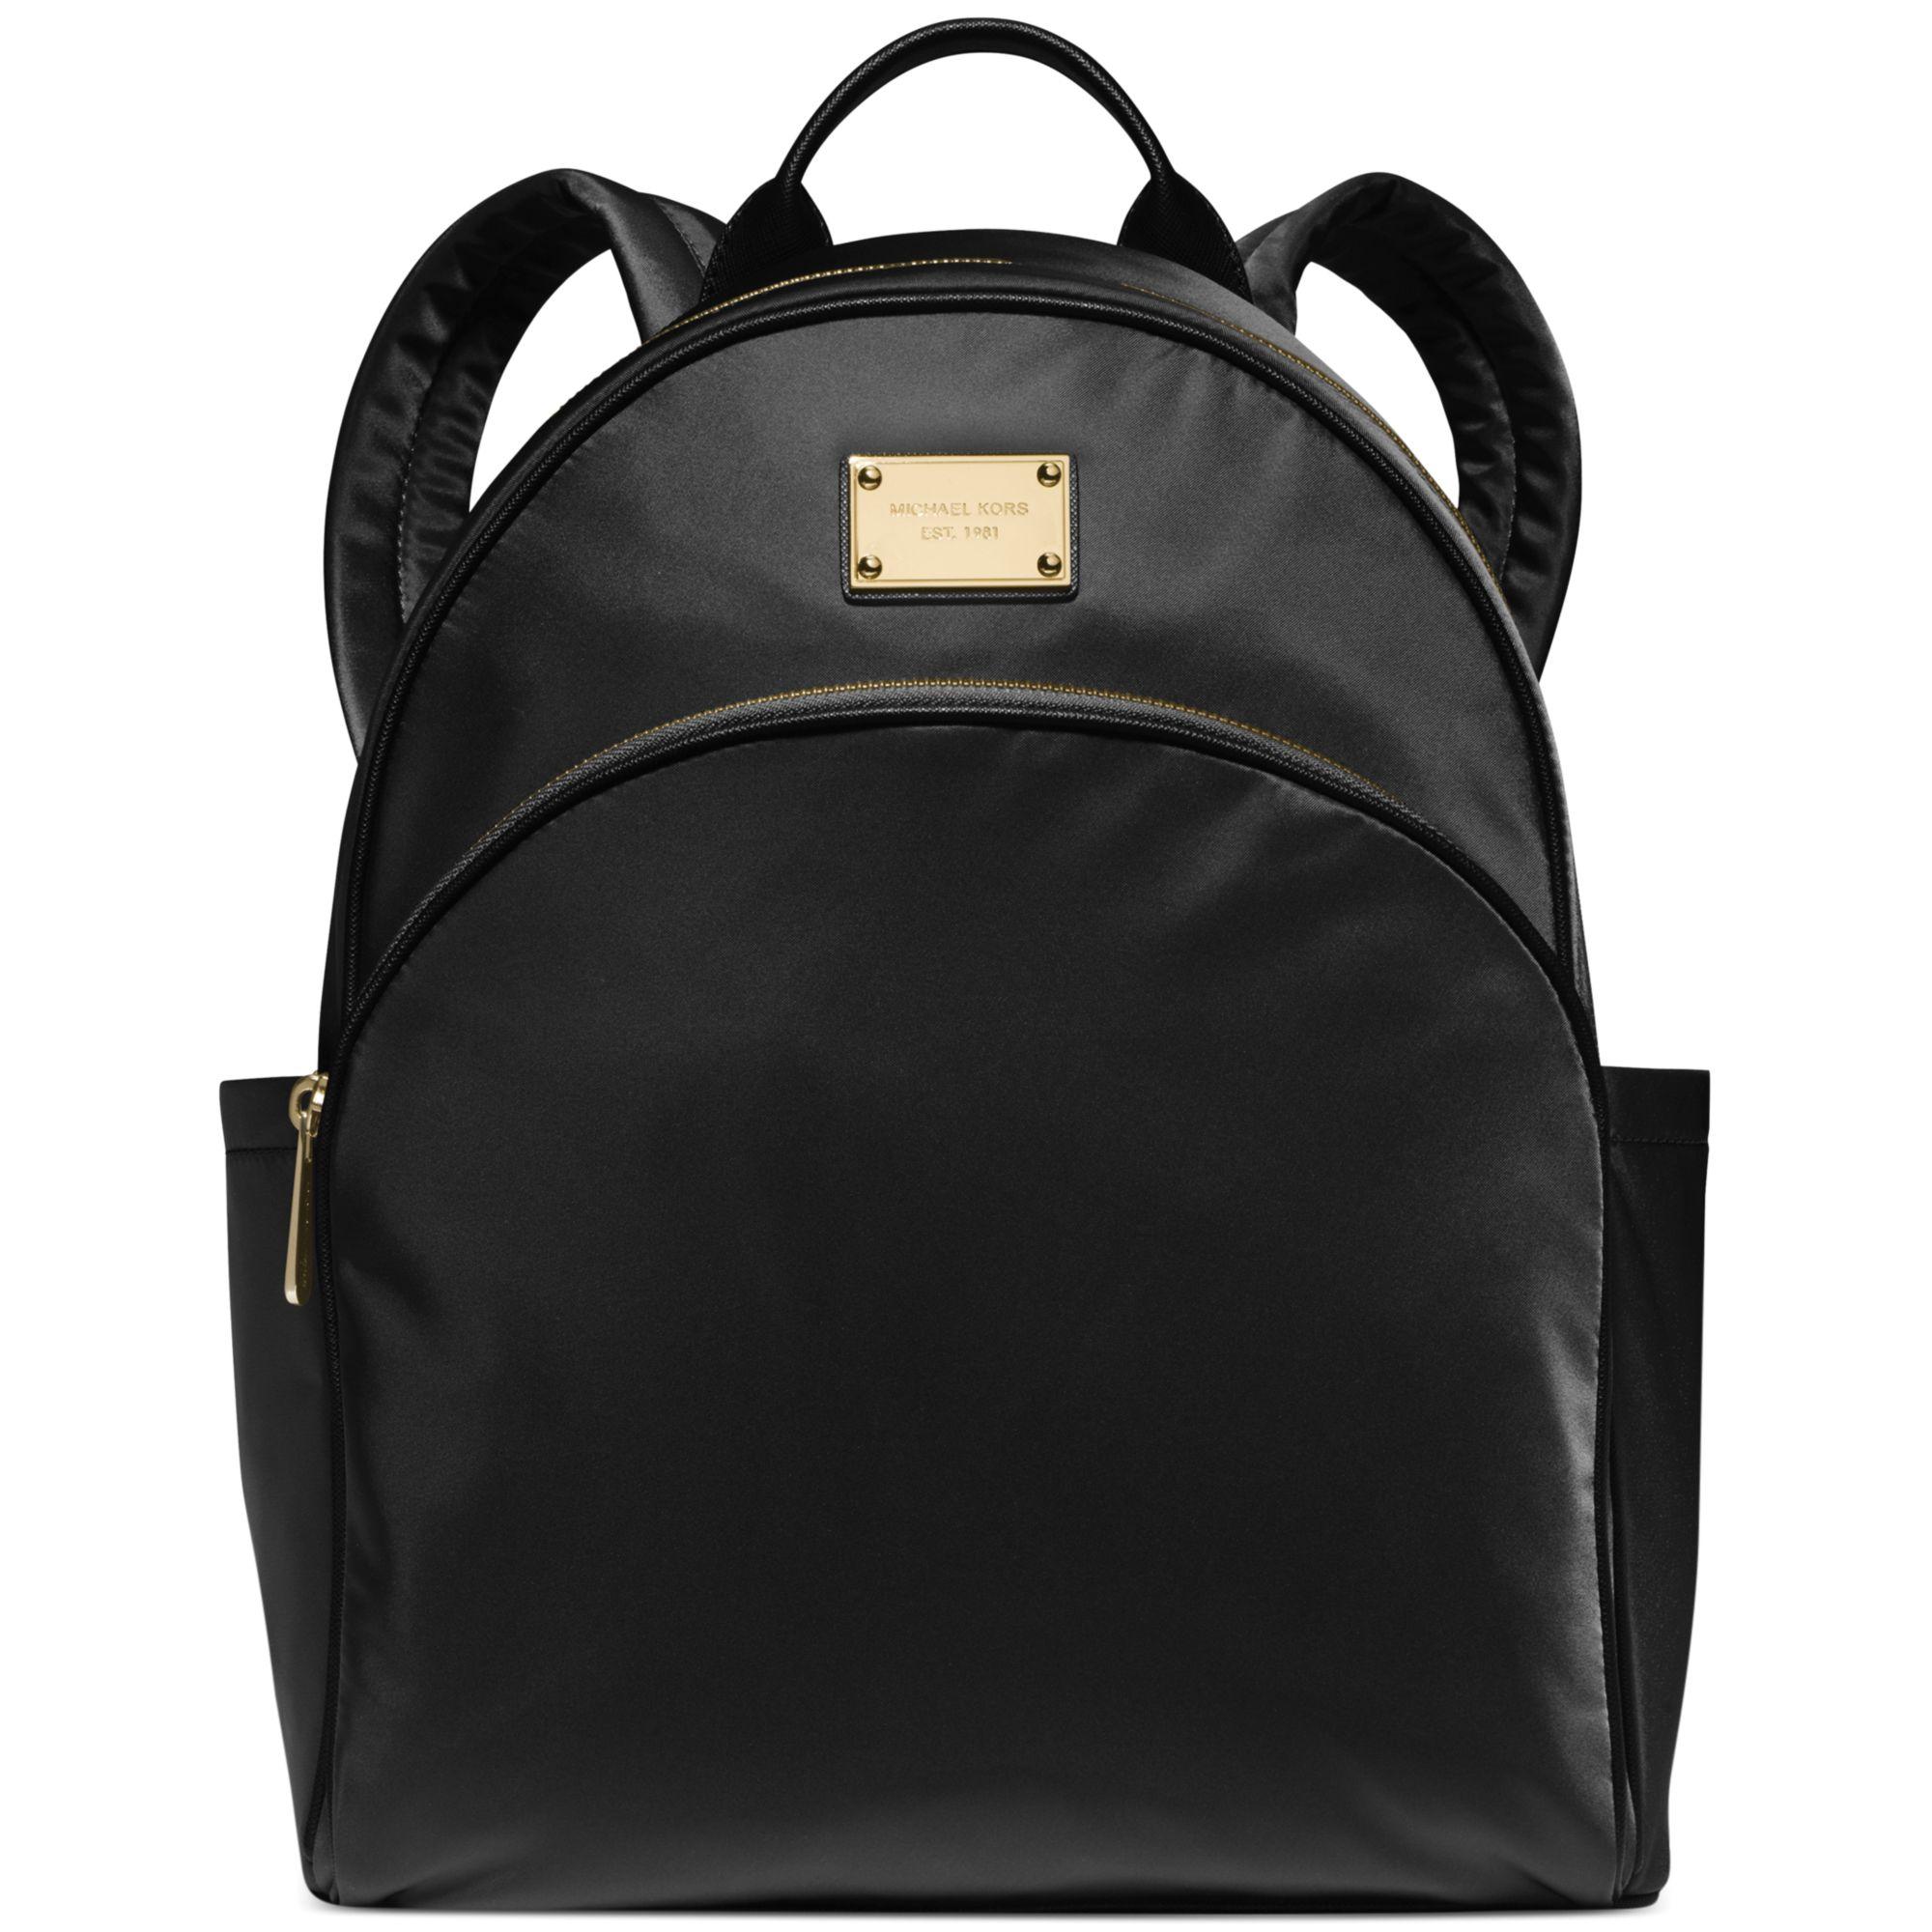 f17bc8decd18 Michael Kors - Black Michael Large Nylon Backpack - A Macys Exclusive - Lyst